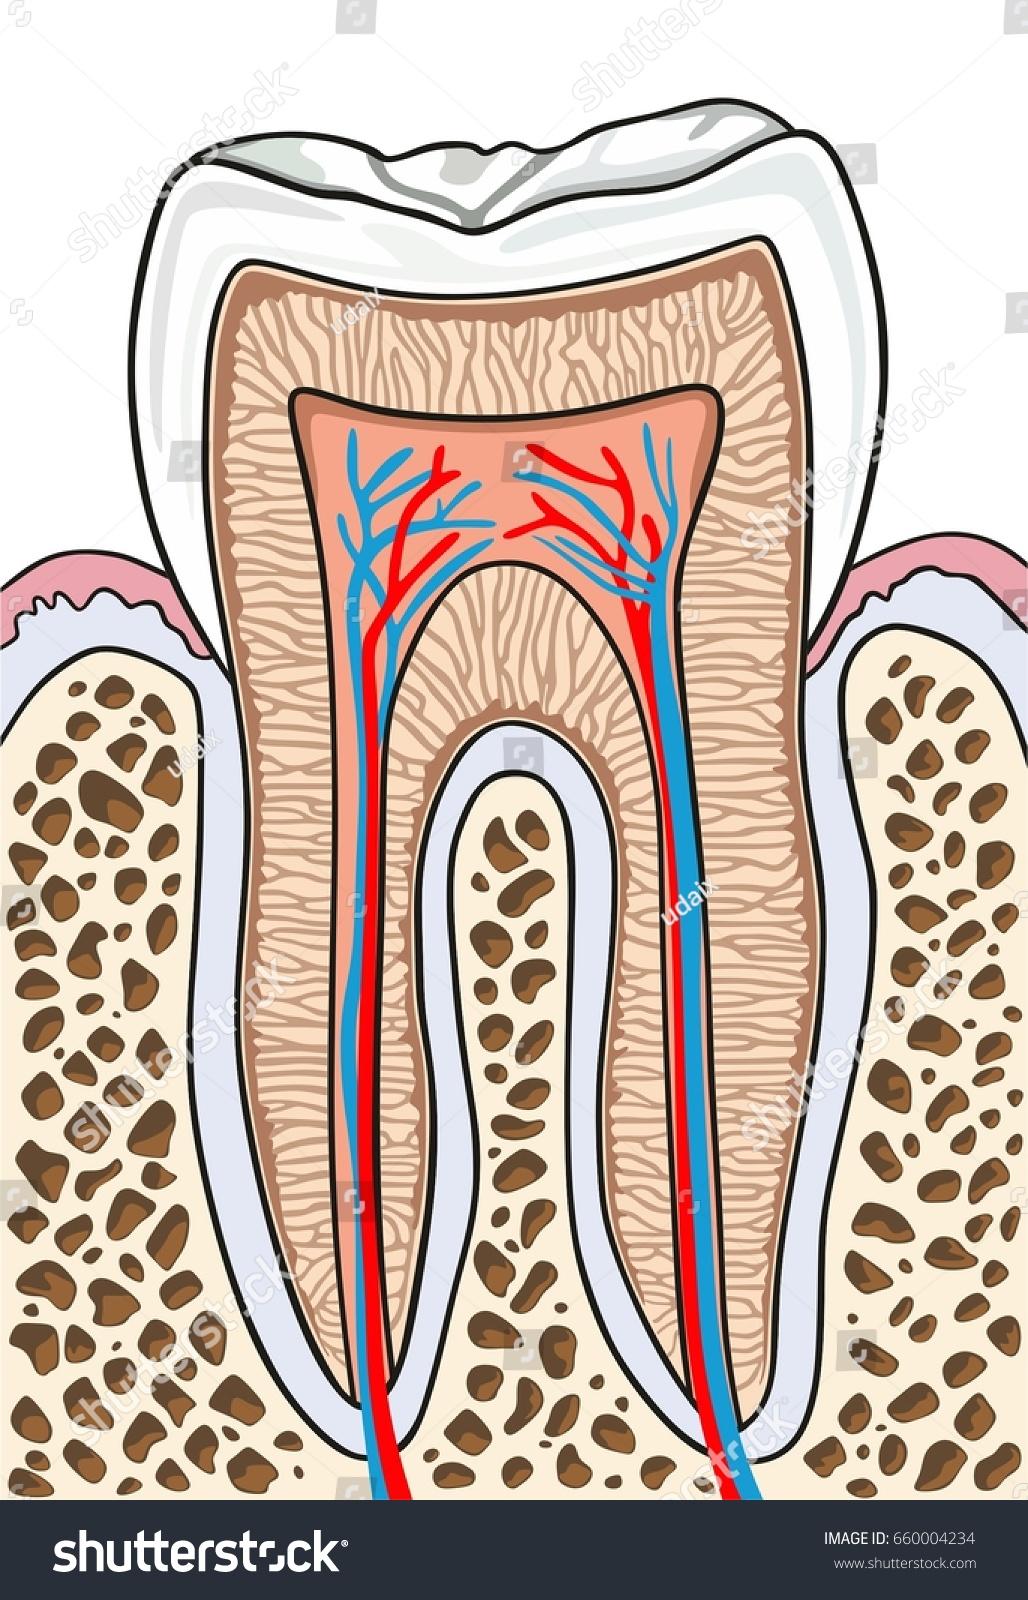 Dental pulp anatomy